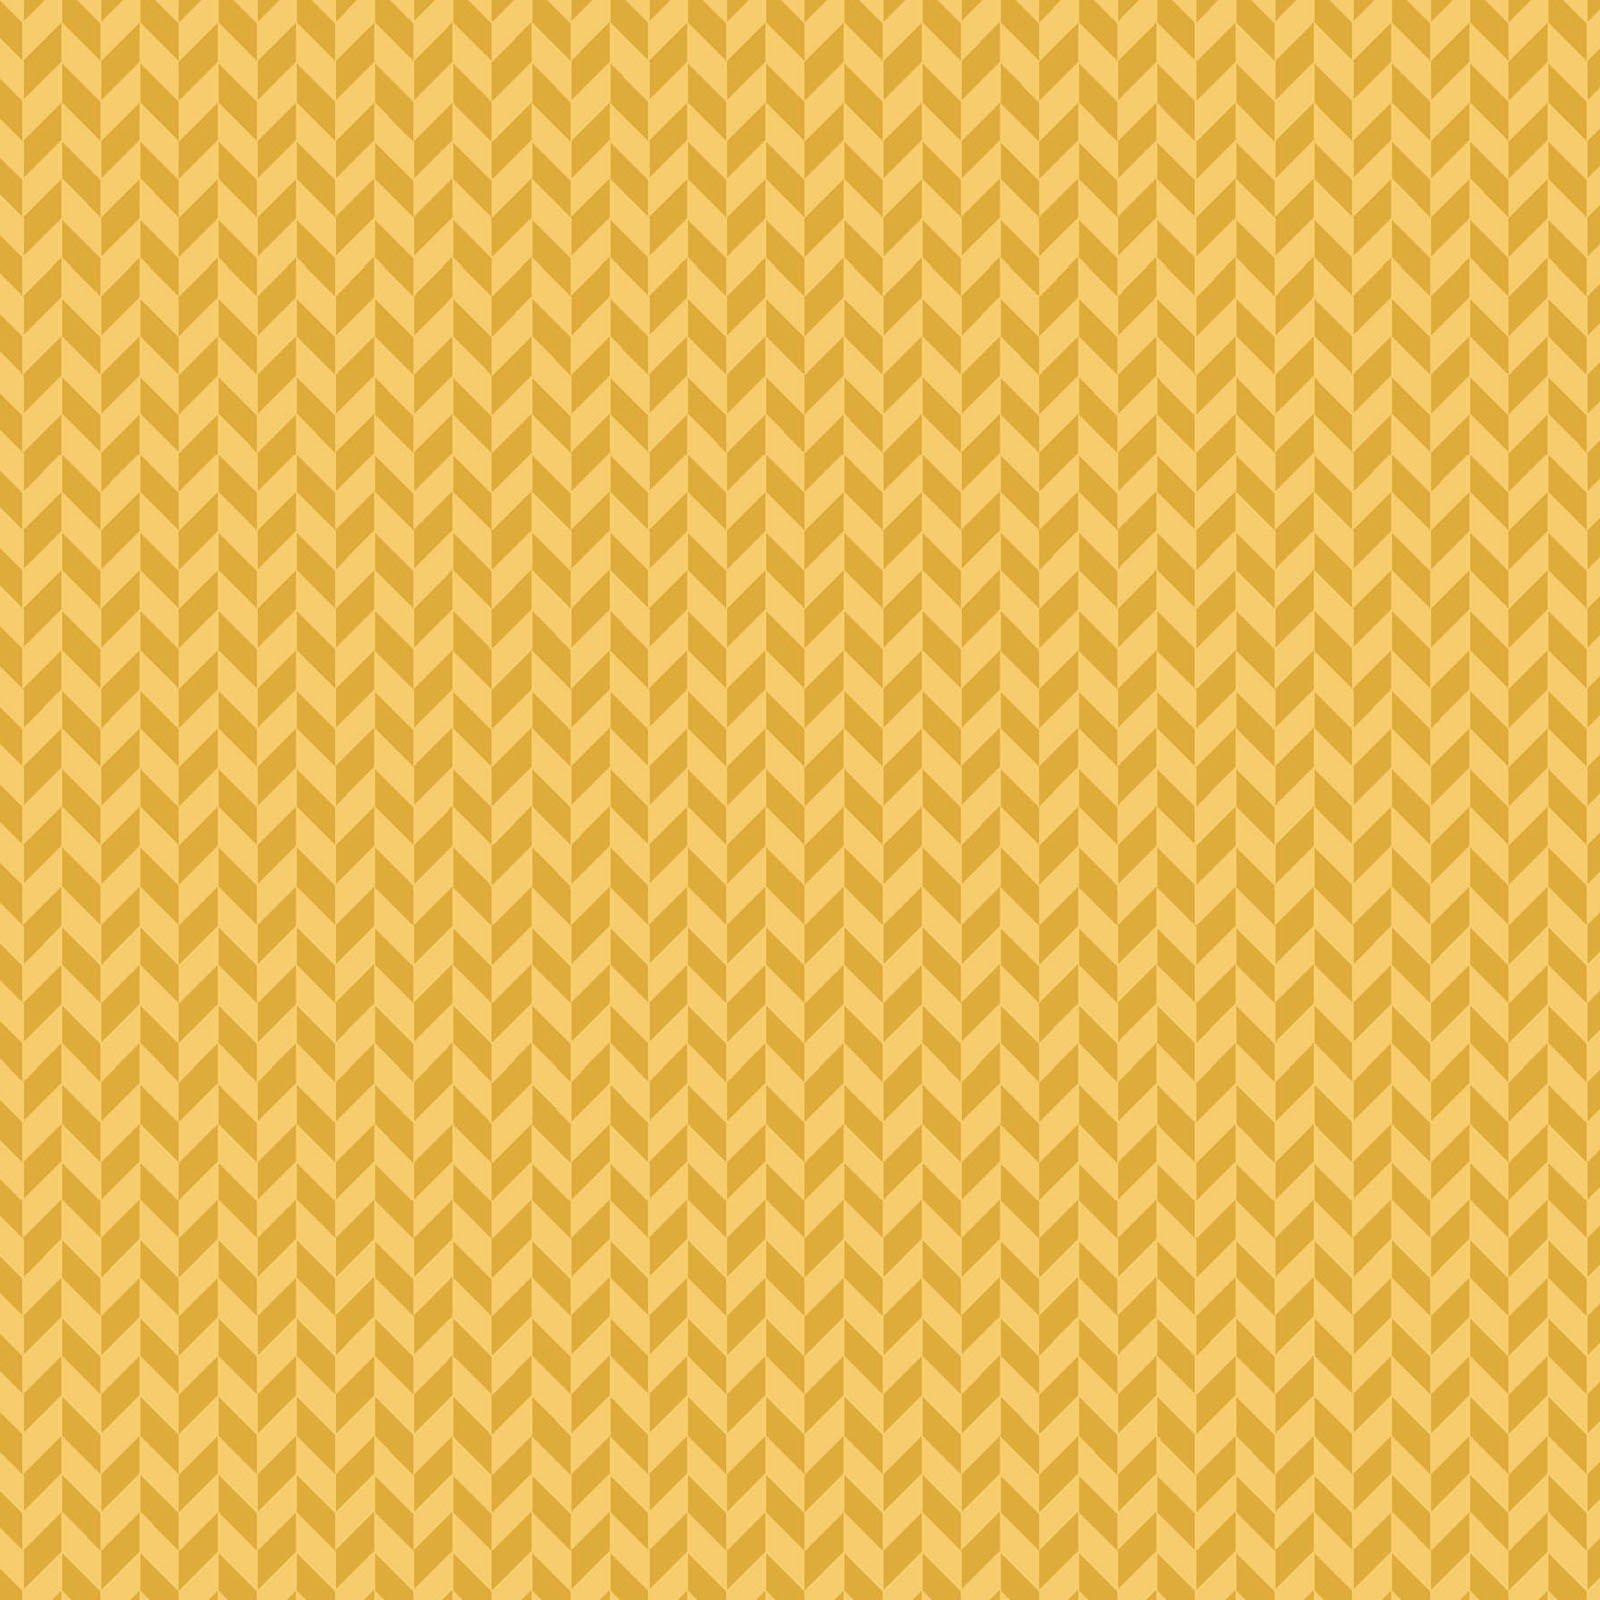 Make Yourself at Home : Herringbone Texture Sunshine - #MAS9397-S - By Kim Christopherson - Kimberbell